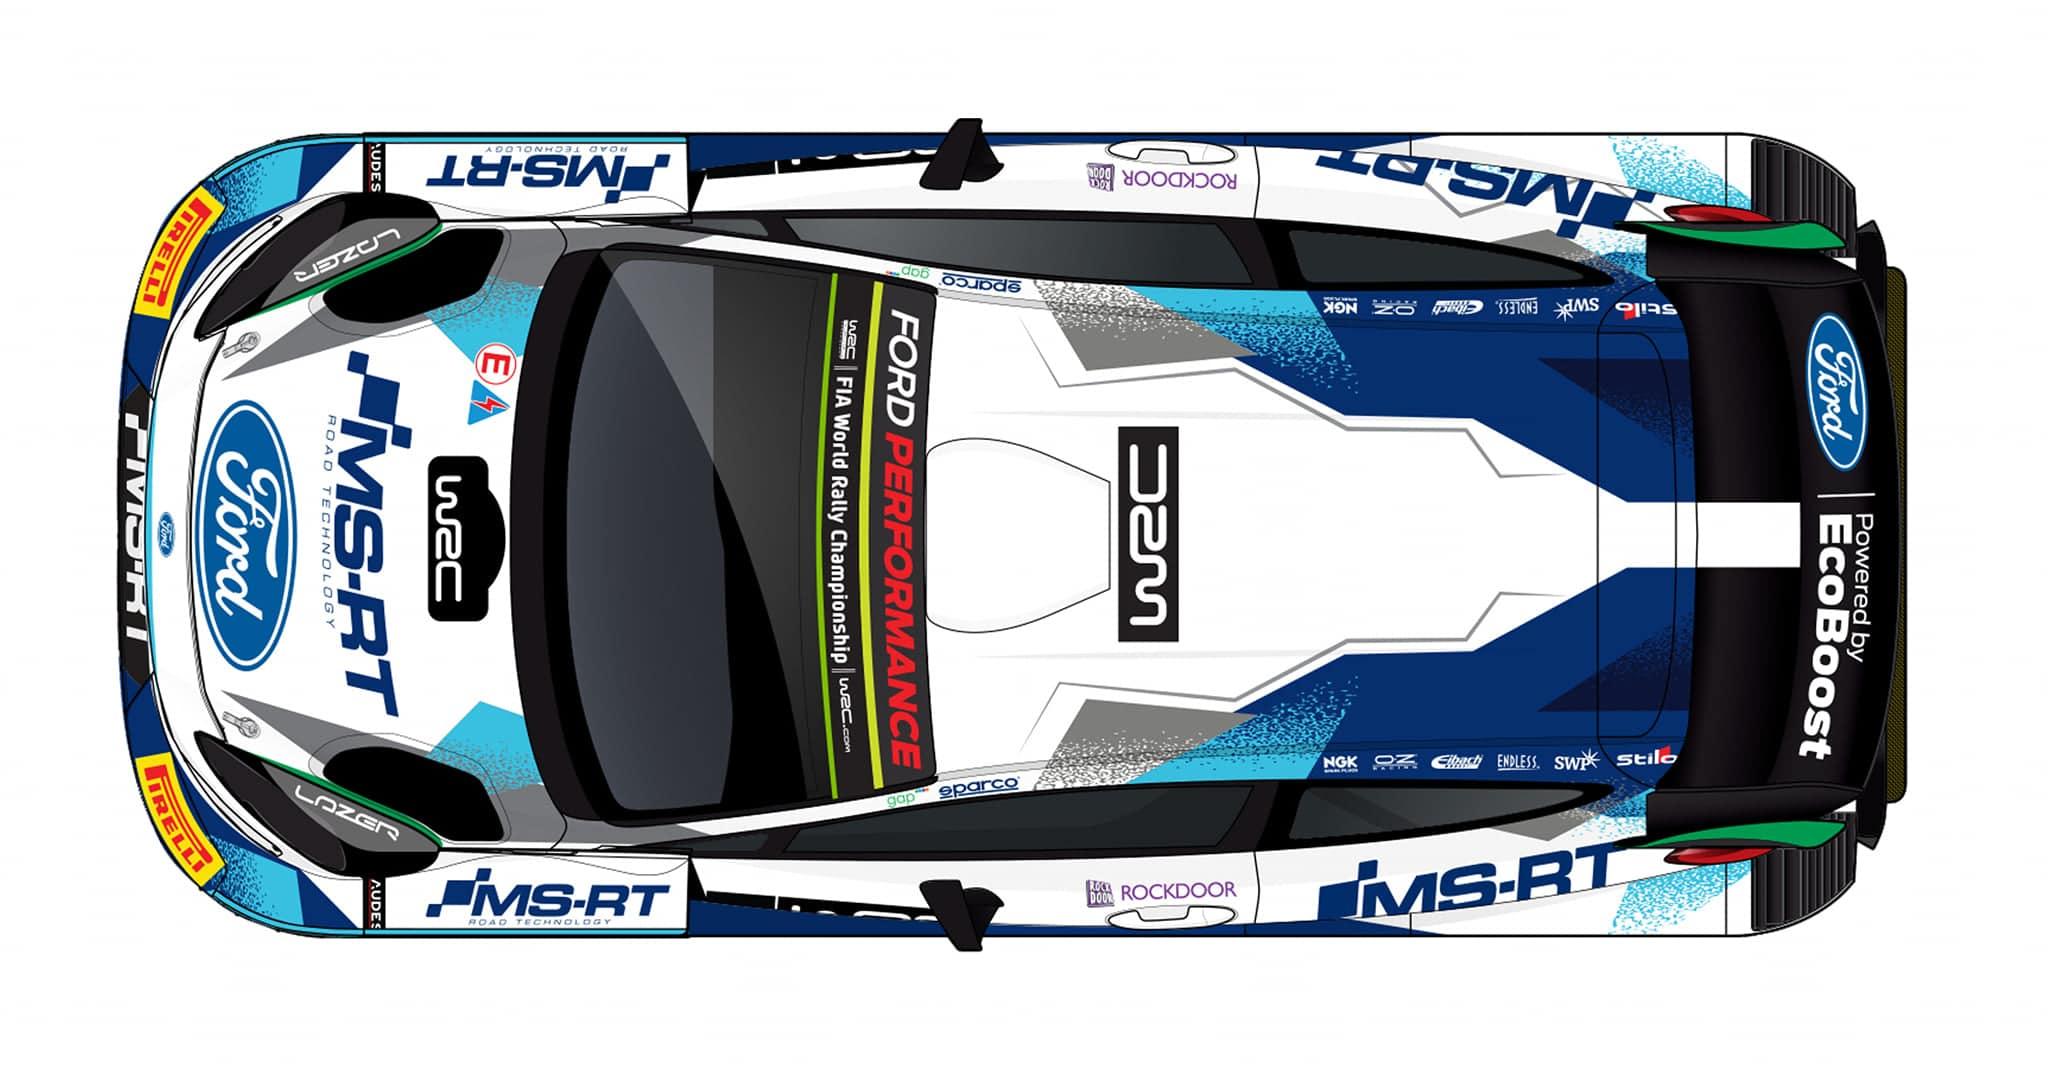 La Ford Fiesta Rally1 (WRC) pour 2021. © : M-Sport